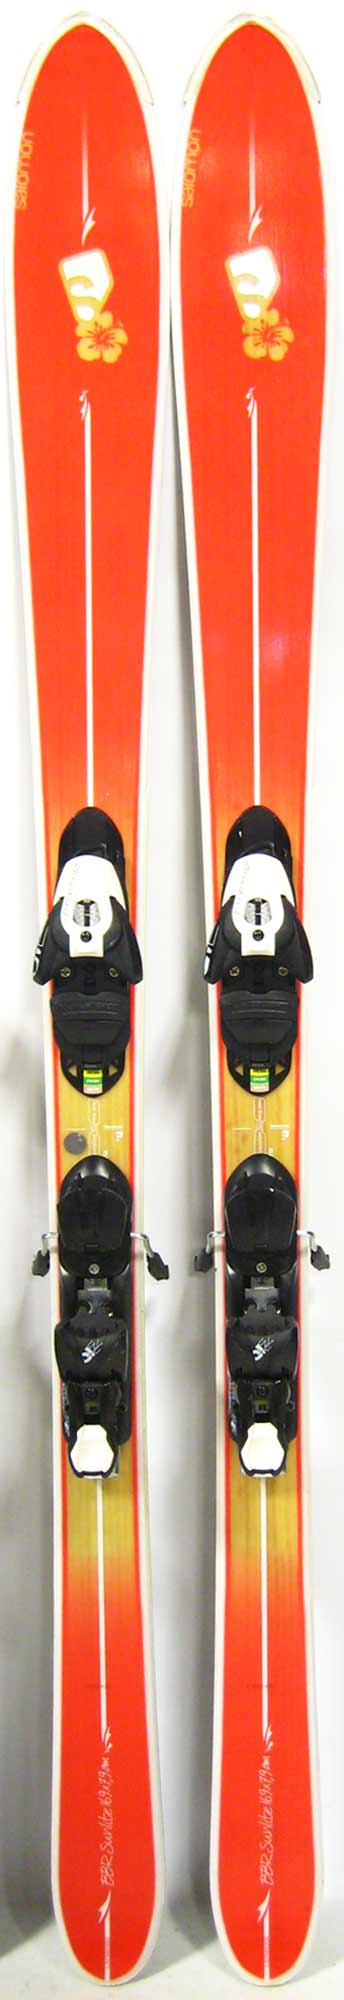 picked up the best best supplier Salomon BBR Sunlite Skis w Bindings